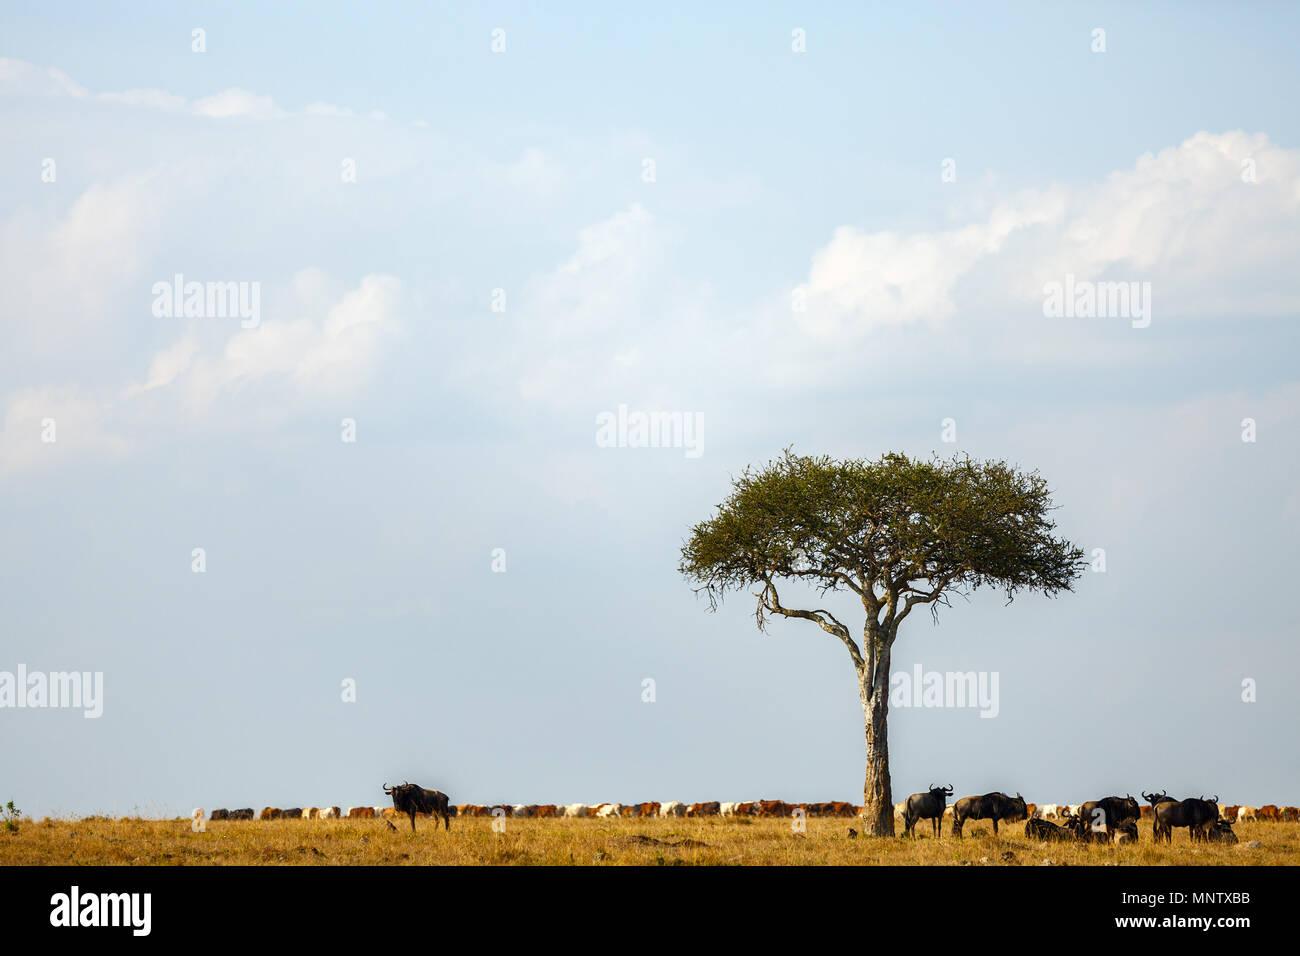 Wildebeests sotto alberi di acacia nel Masai Mara Kenya Immagini Stock